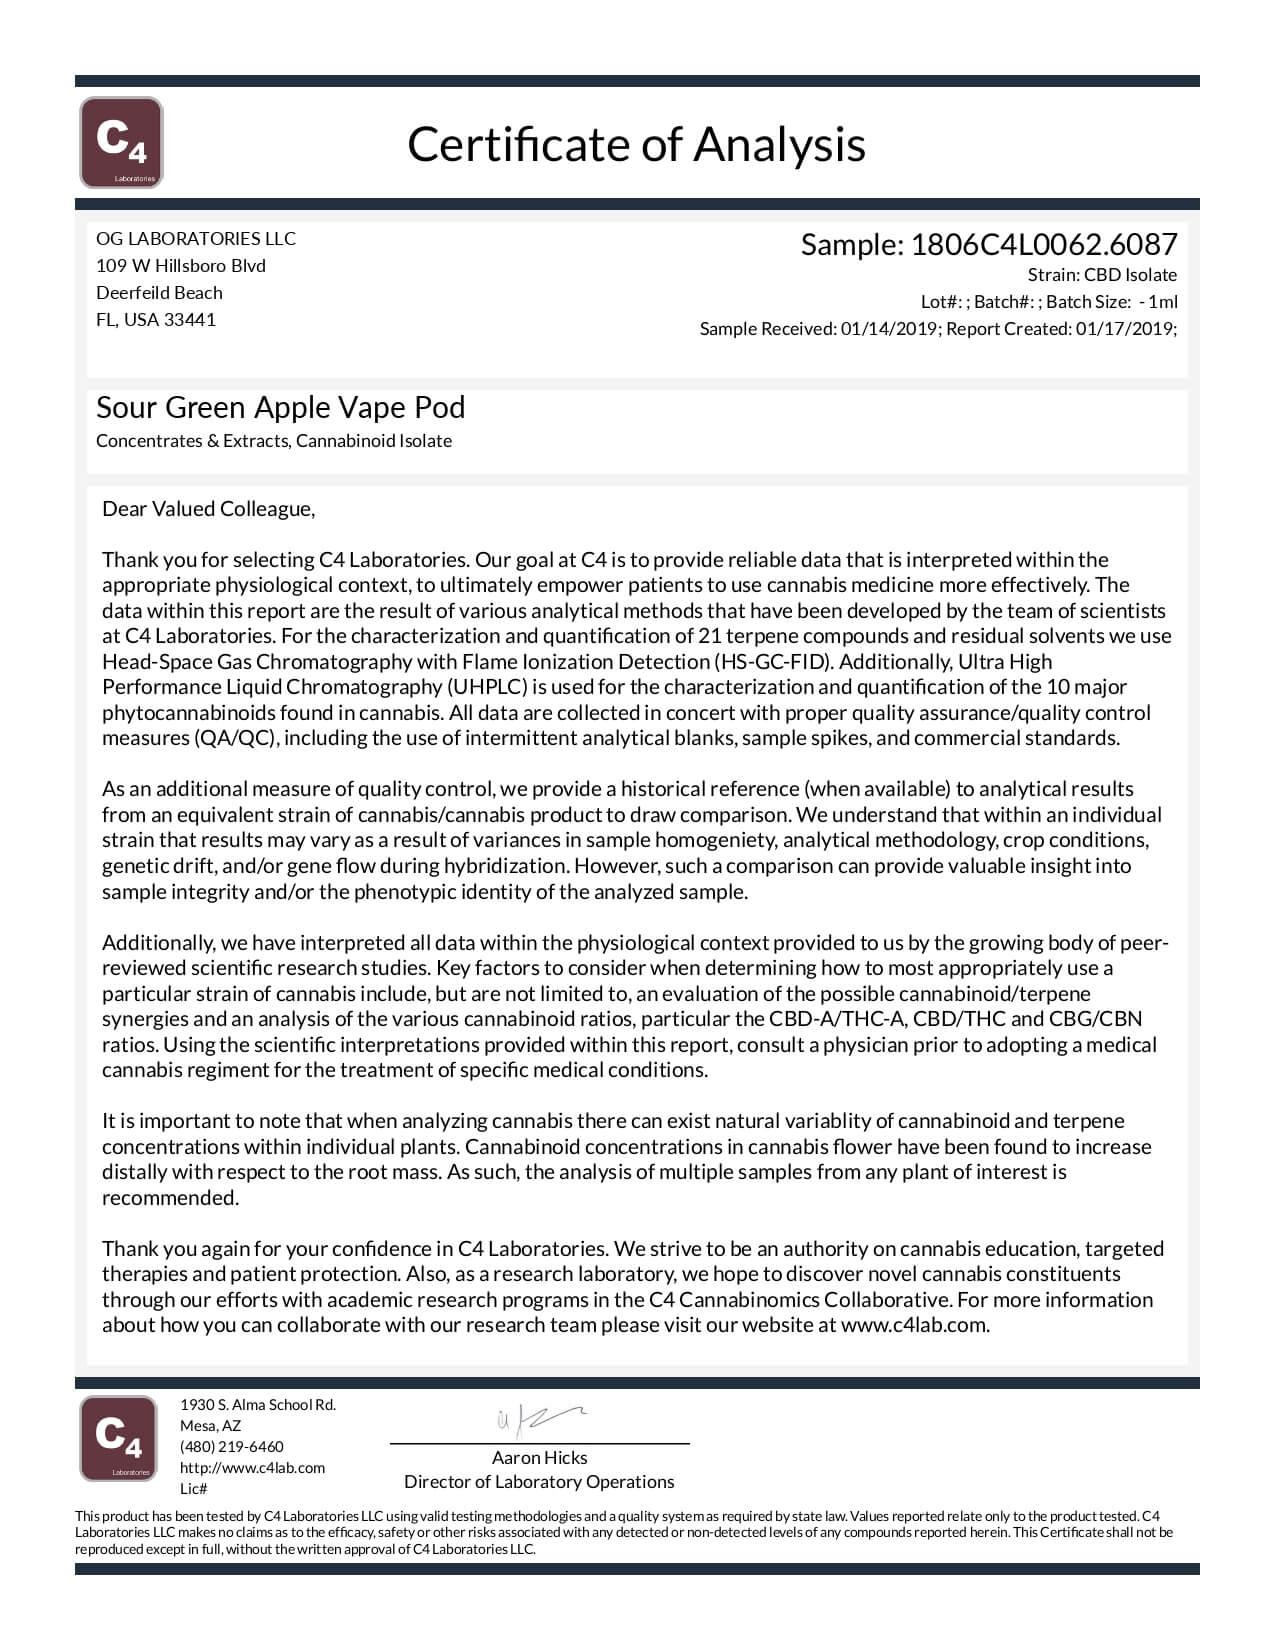 OG Labs CBD Pod Sour Green Apple Lab Report